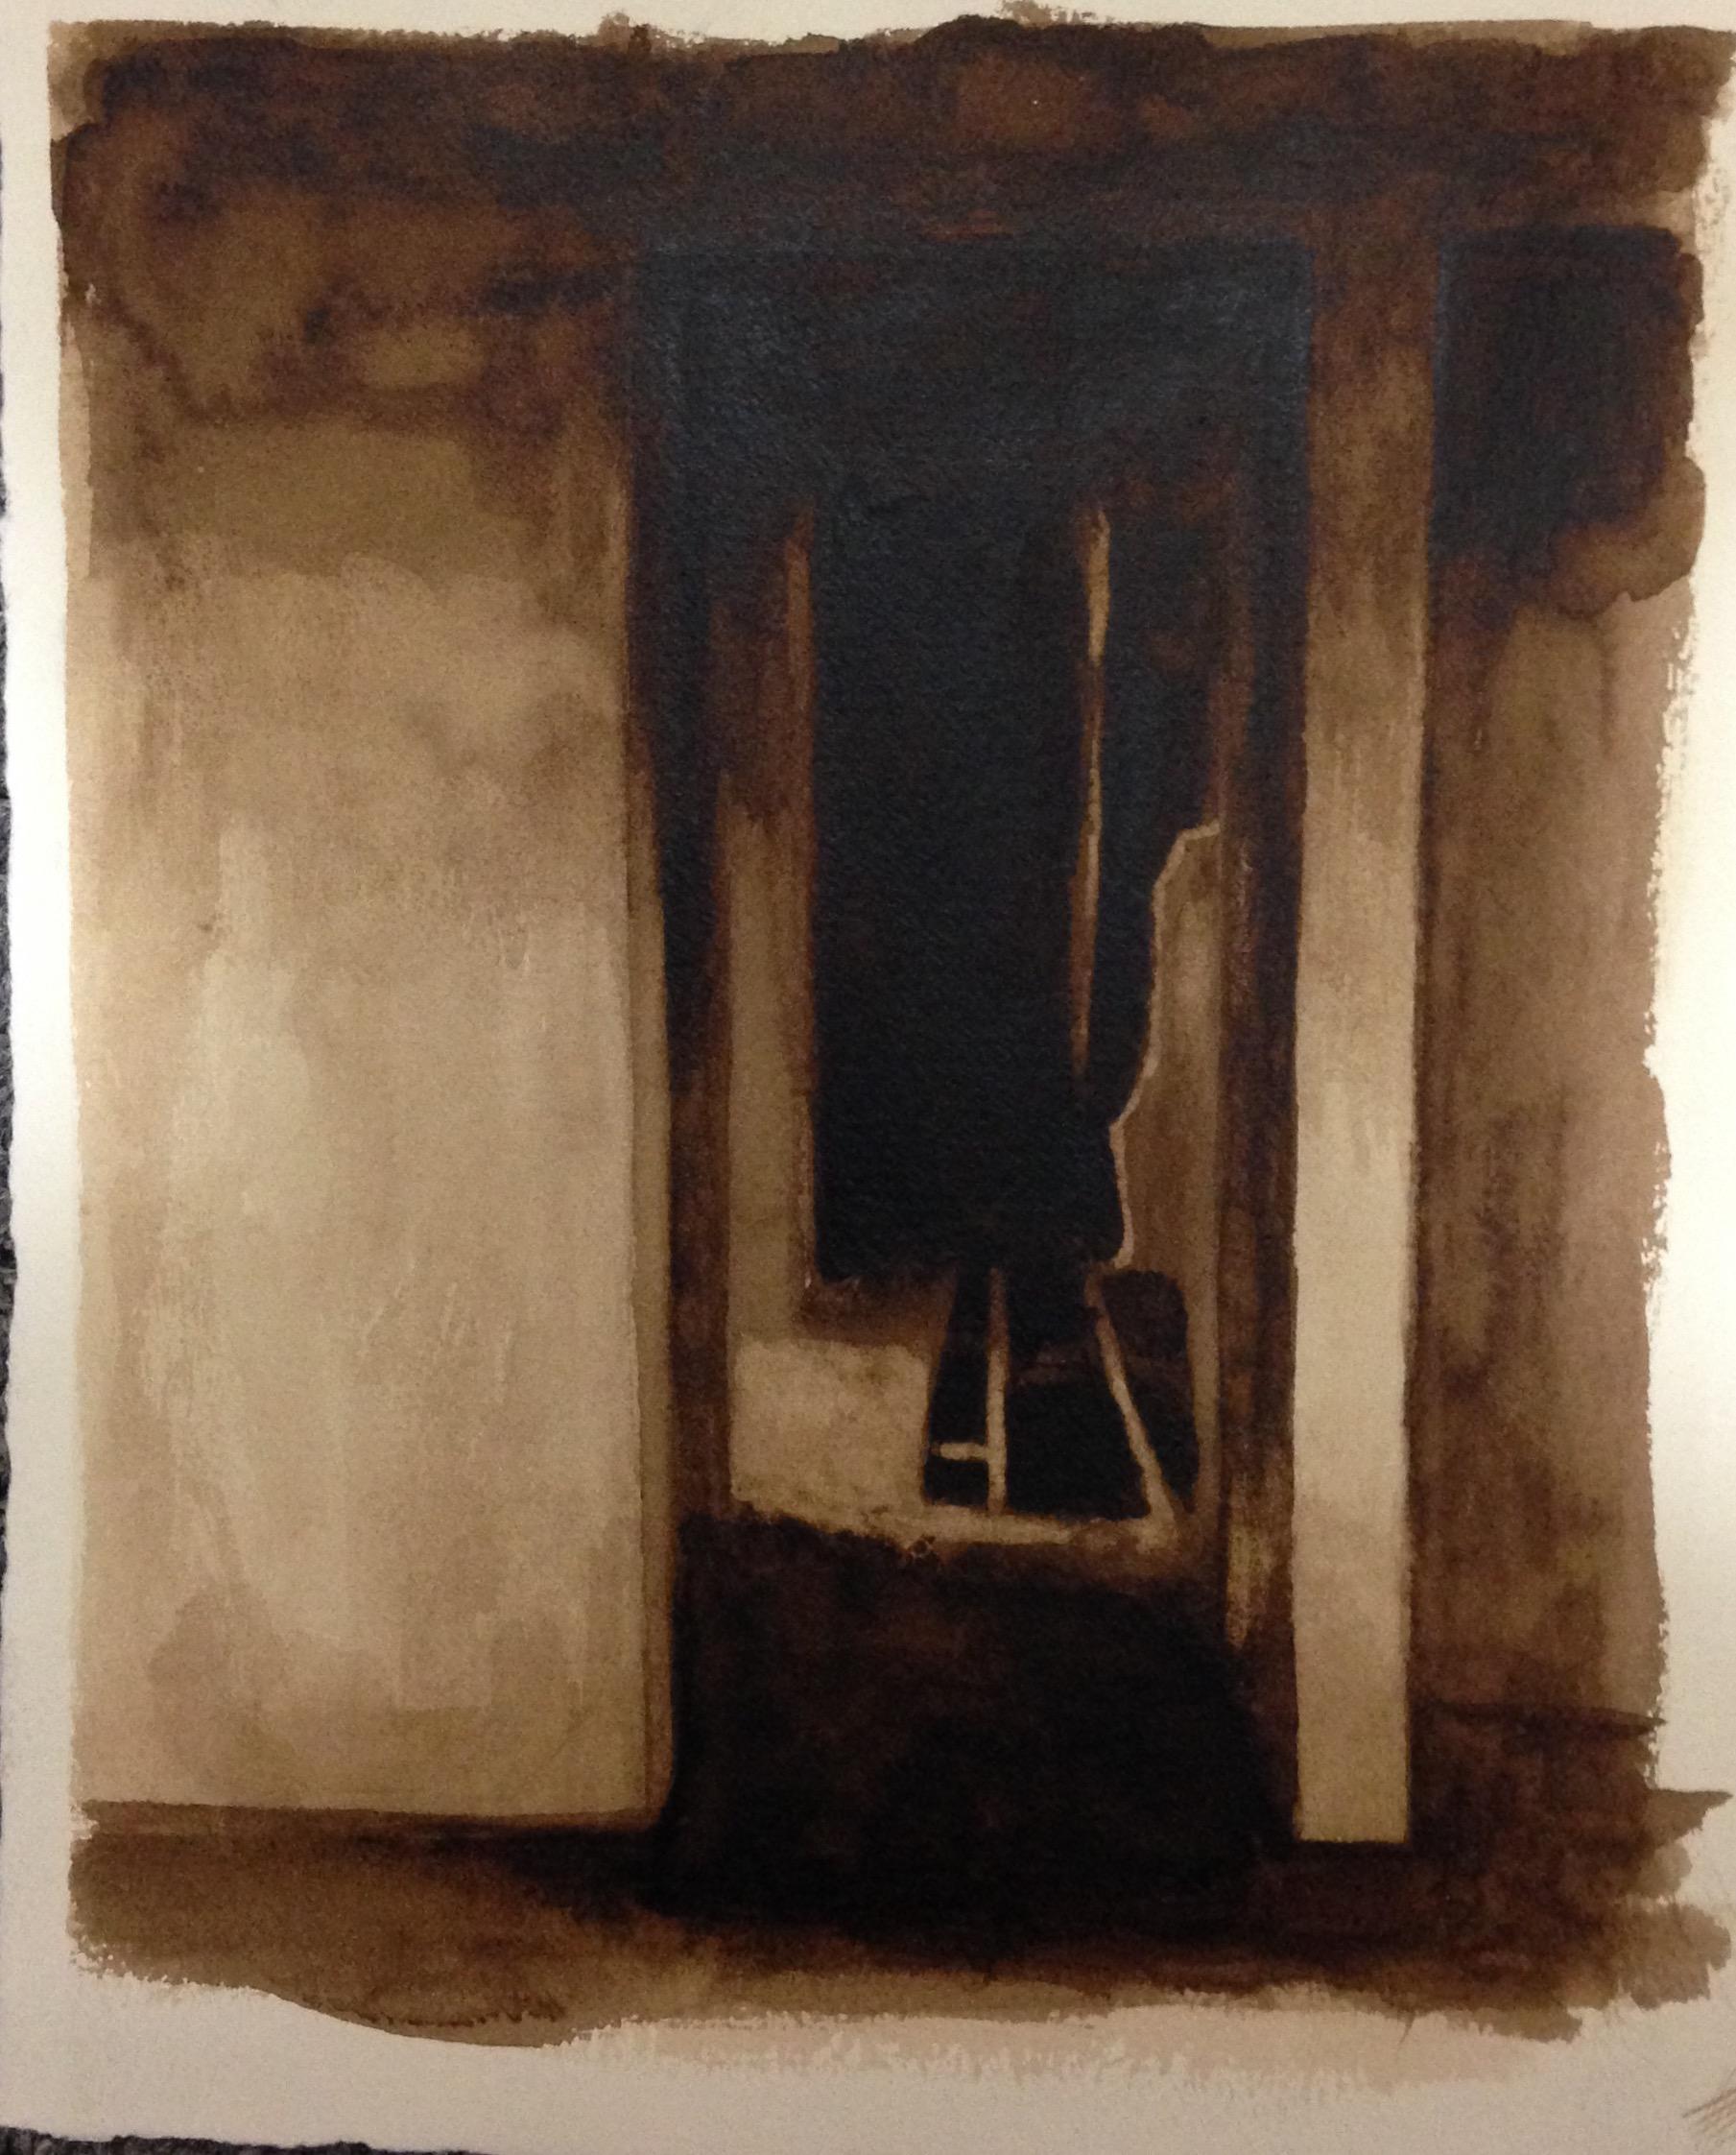 Tenold Sundberg-after the fire 2 12x18 ink 2012.jpg